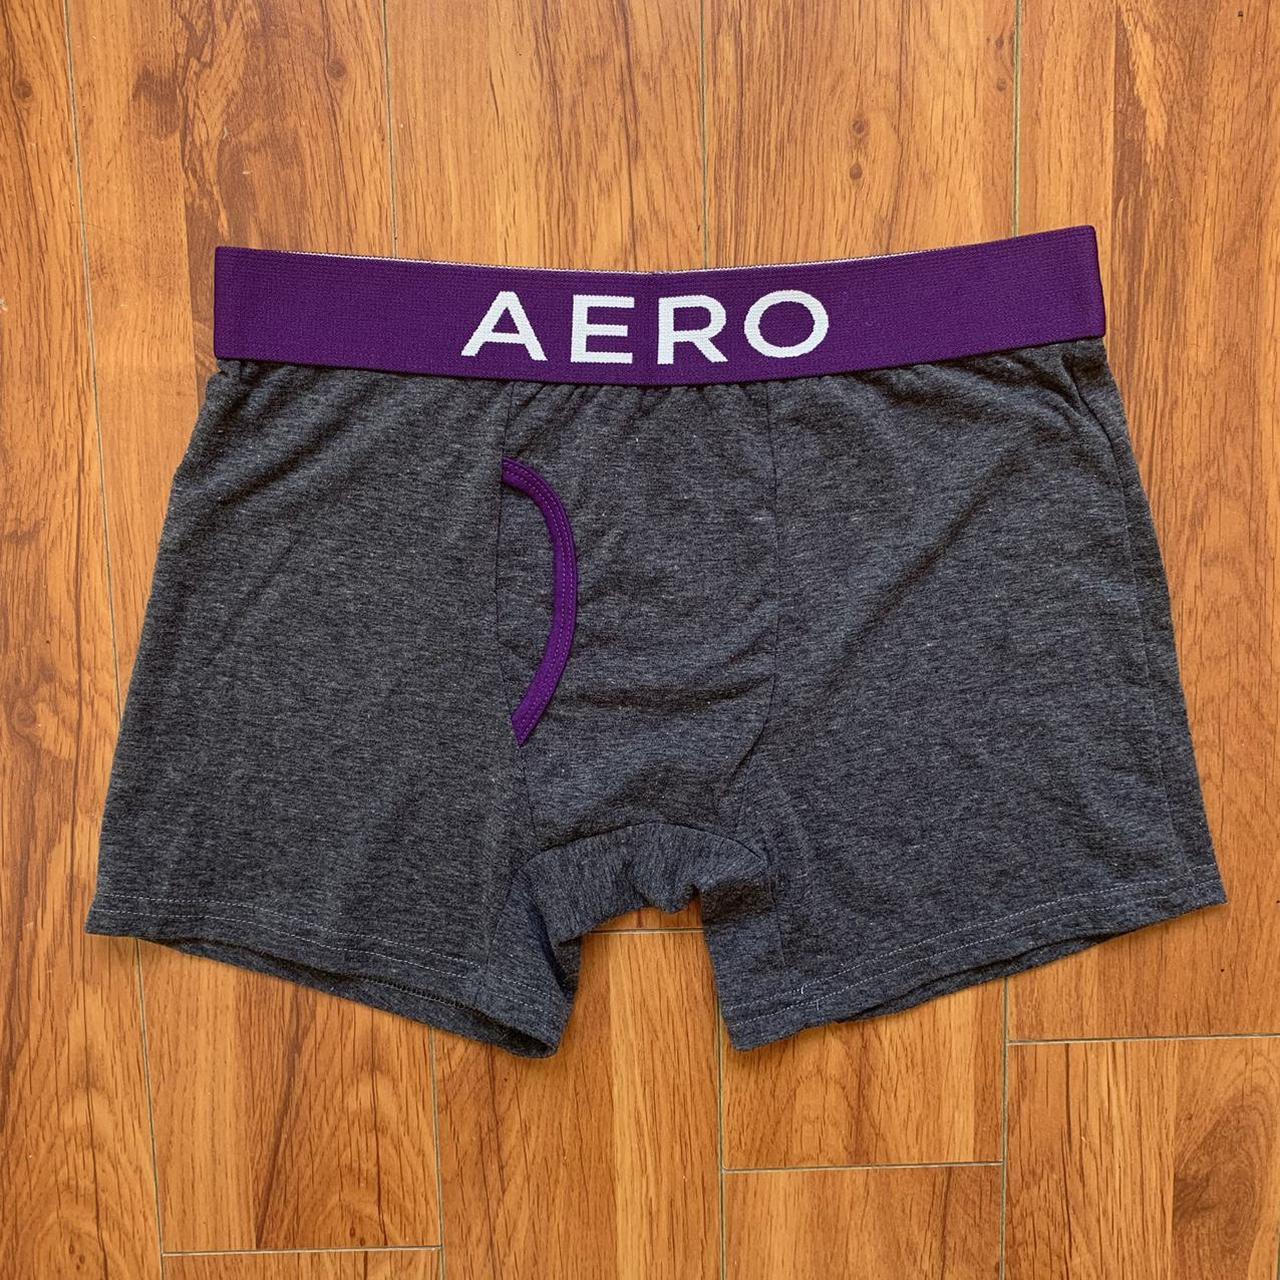 Product Image 1 - Aero Boxer Briefs ⚡️Small/Medium ⚡️100% Cotton  ⚡️Pre-loved,